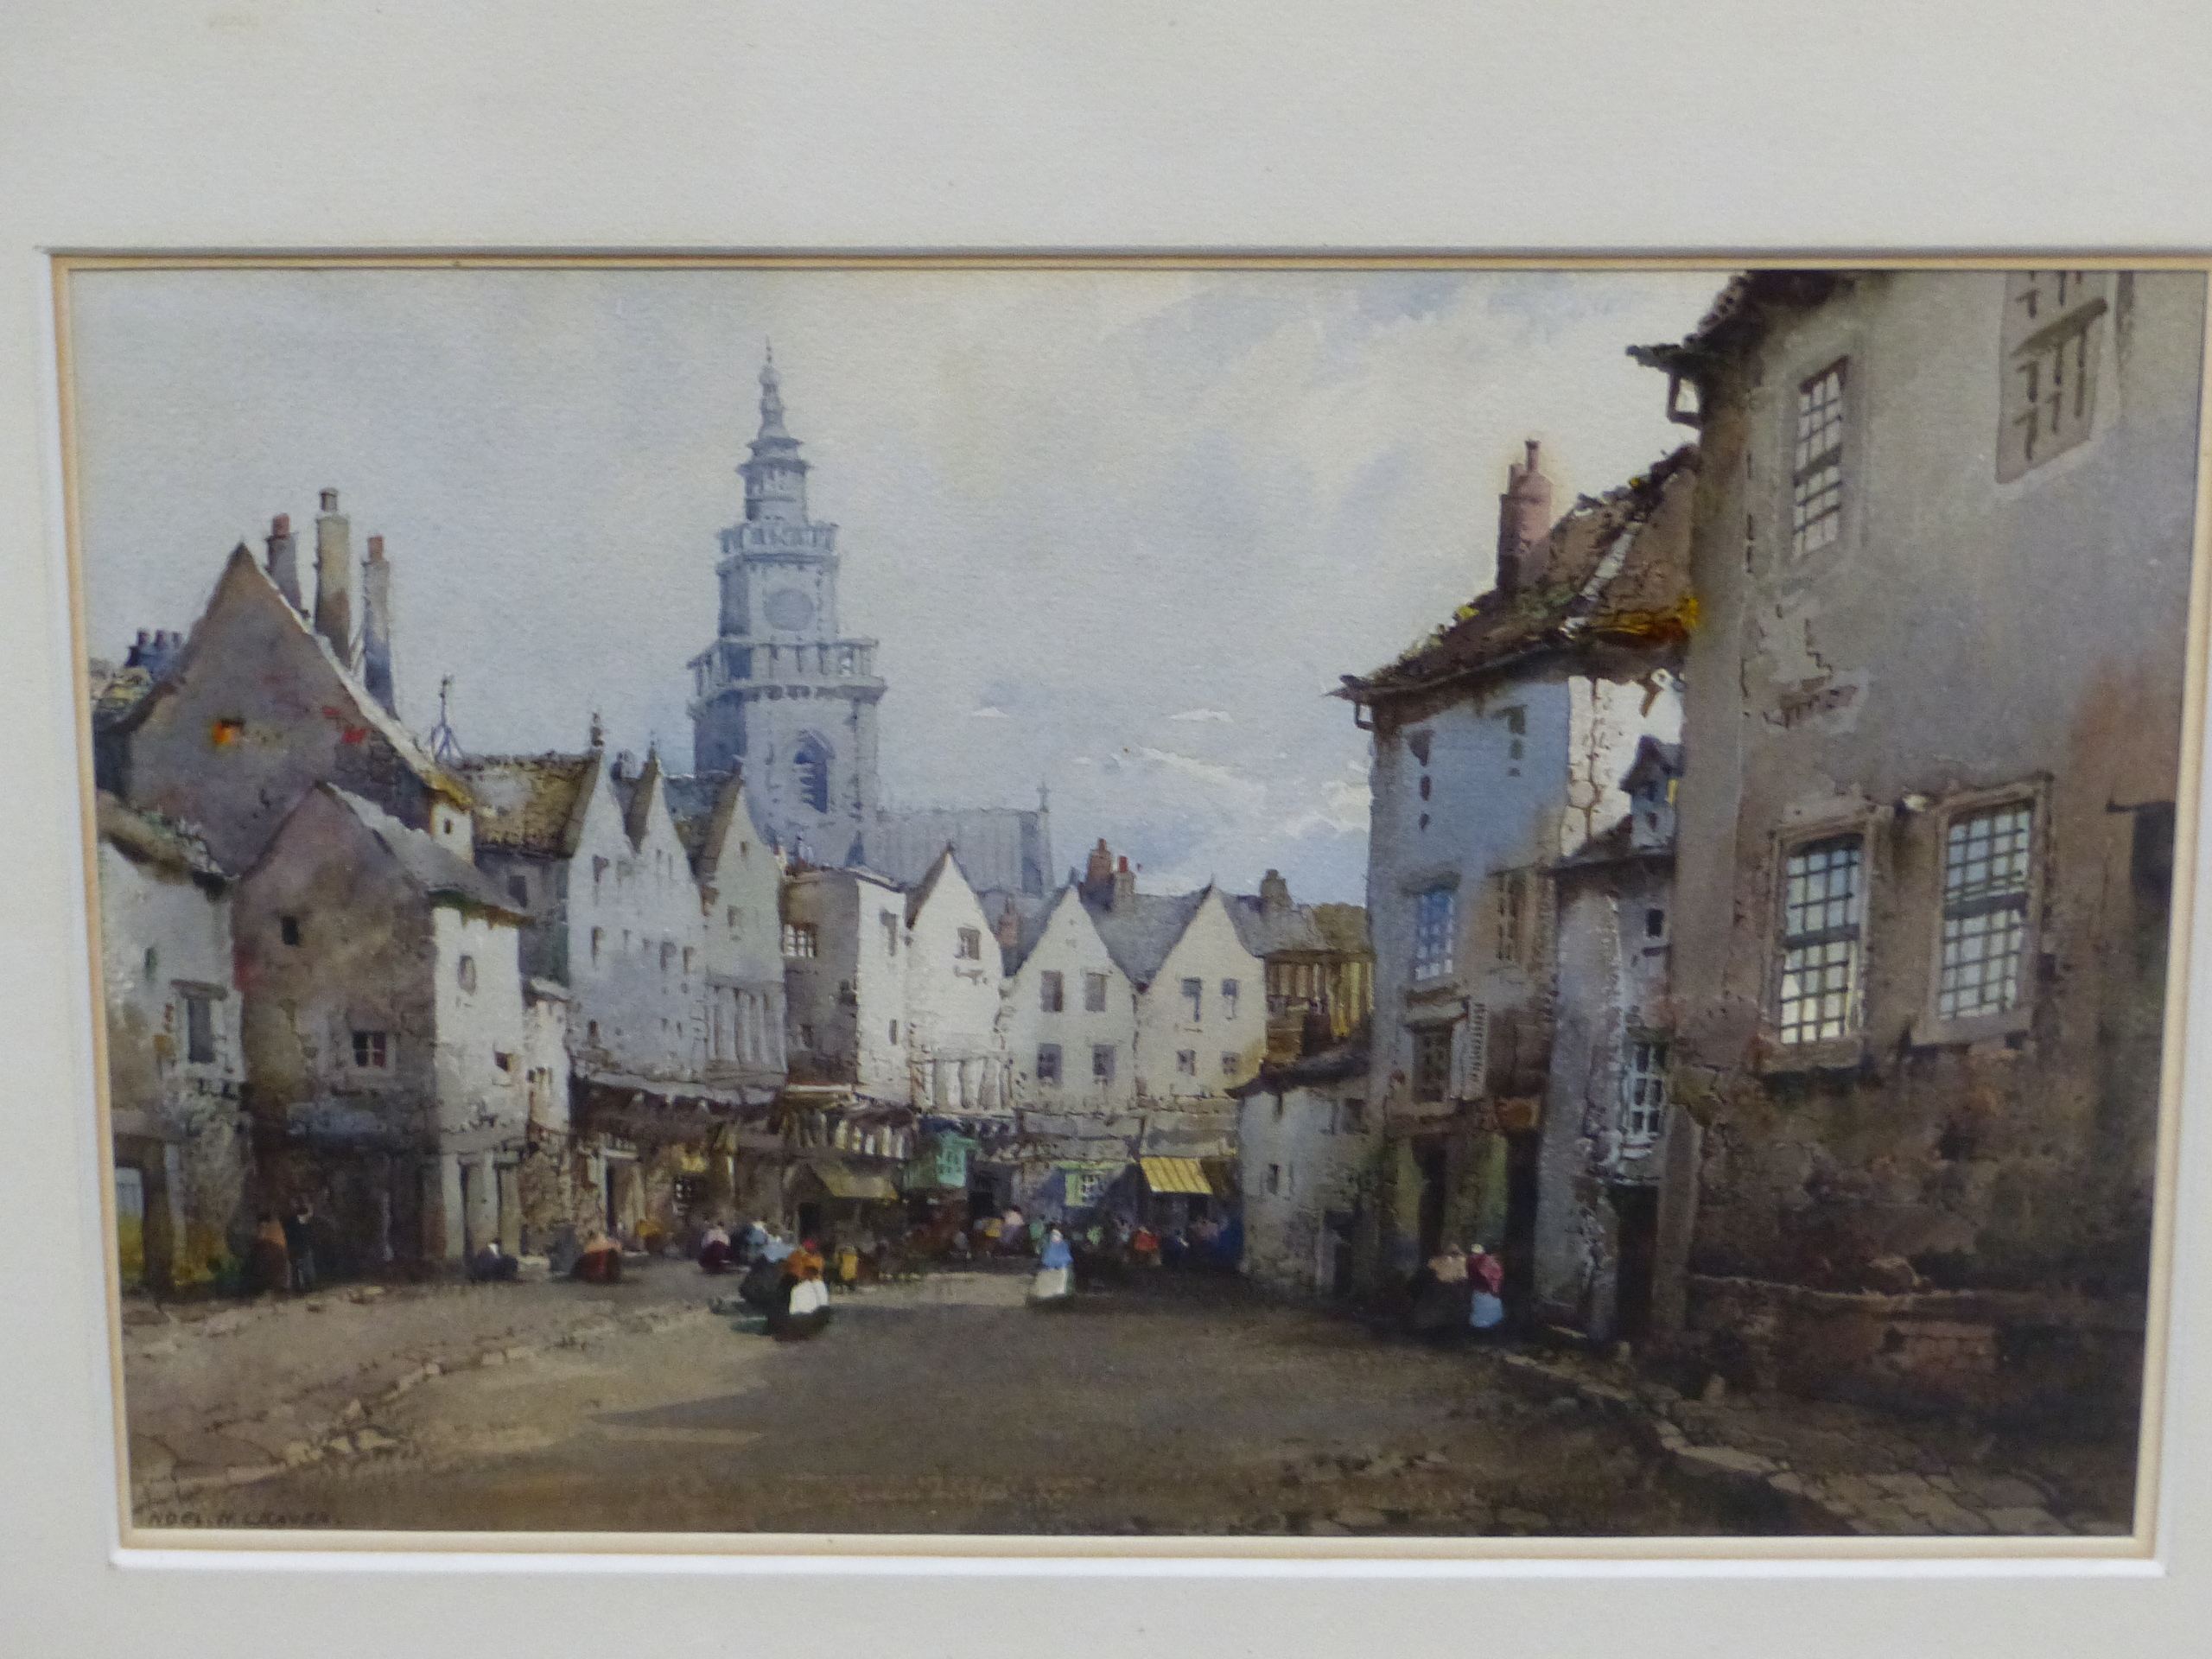 NOEL H LEAVER (1889-1951) THE TOWN MARKET, SIGNED WATERCOLOUR 18 x 26cm